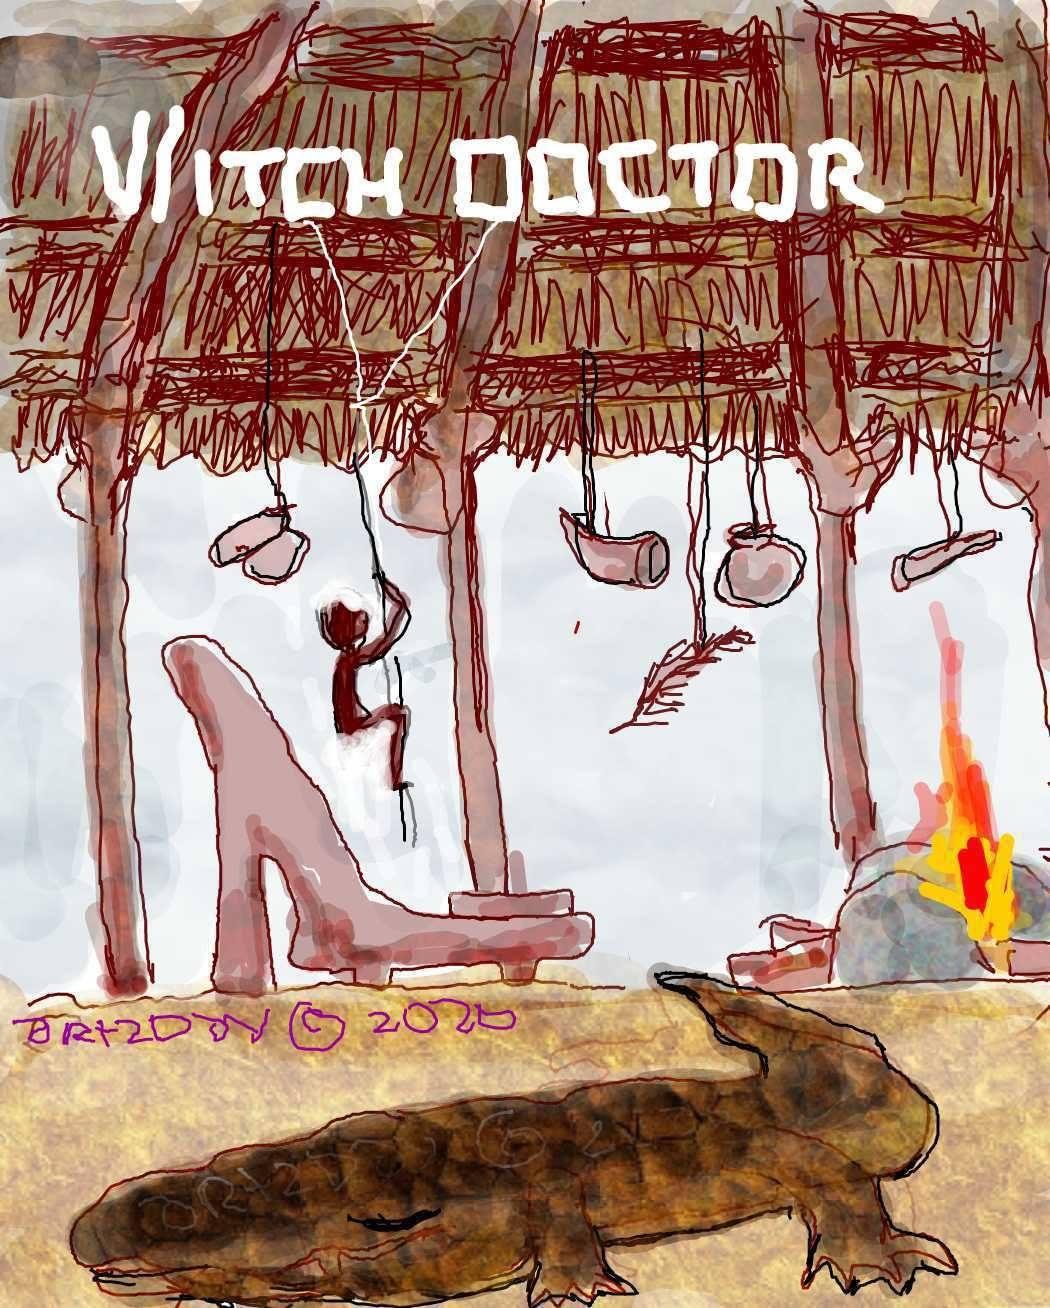 witch doctor, shrine, crocodile